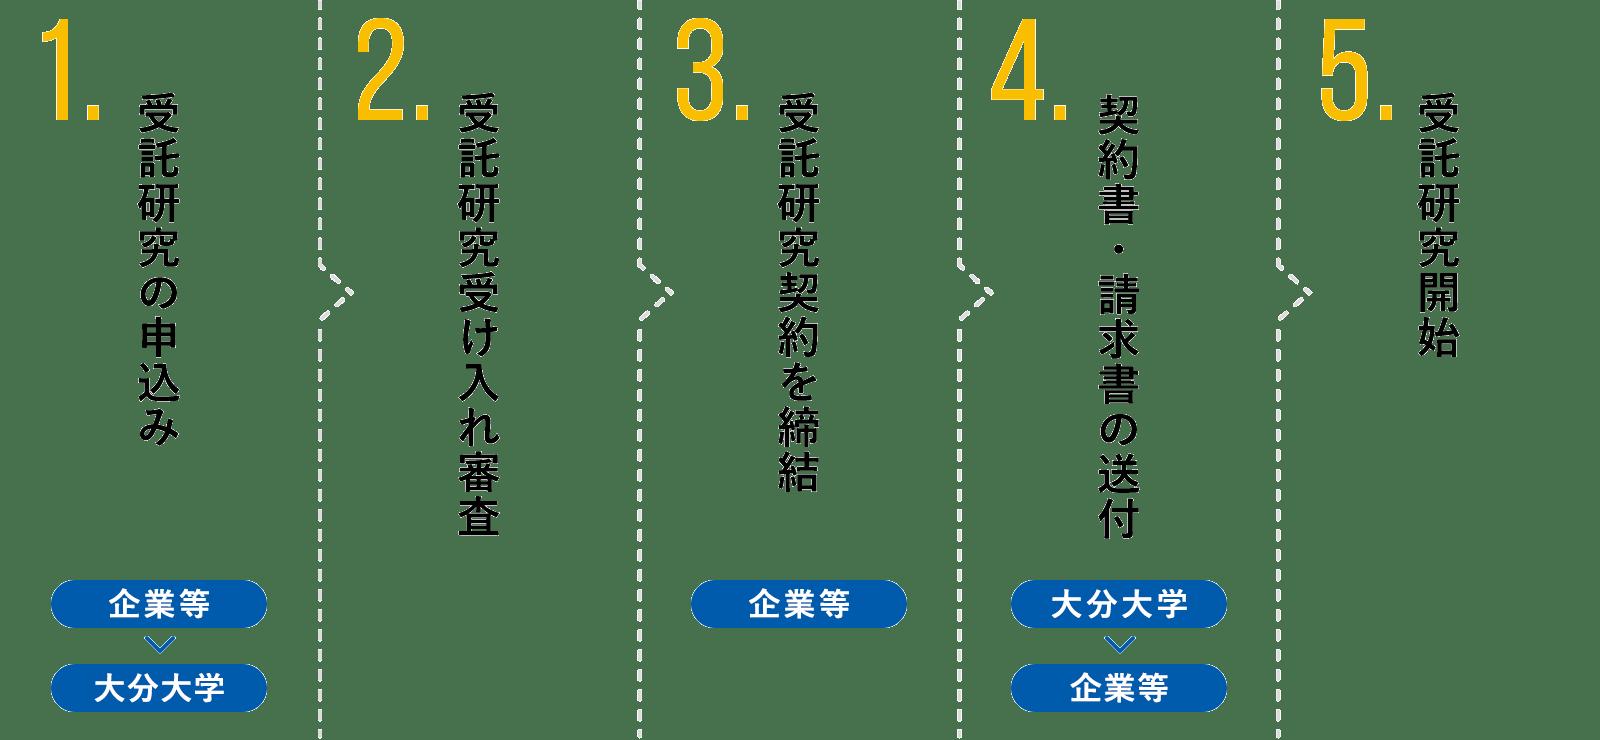 受託研究の手順